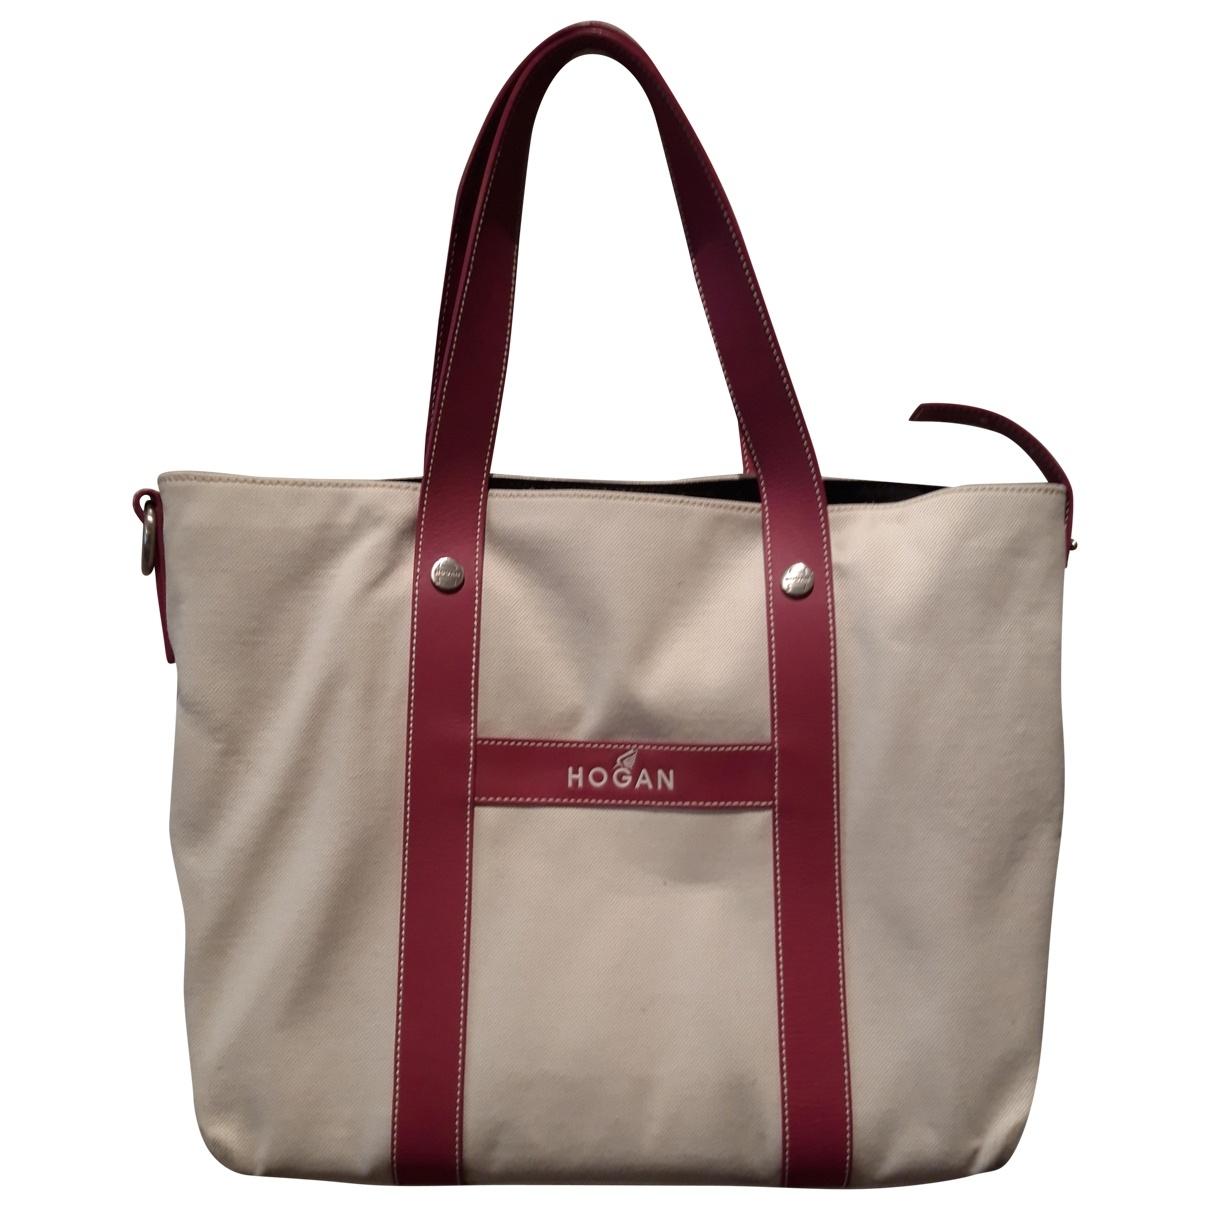 Hogan \N White Cotton handbag for Women \N